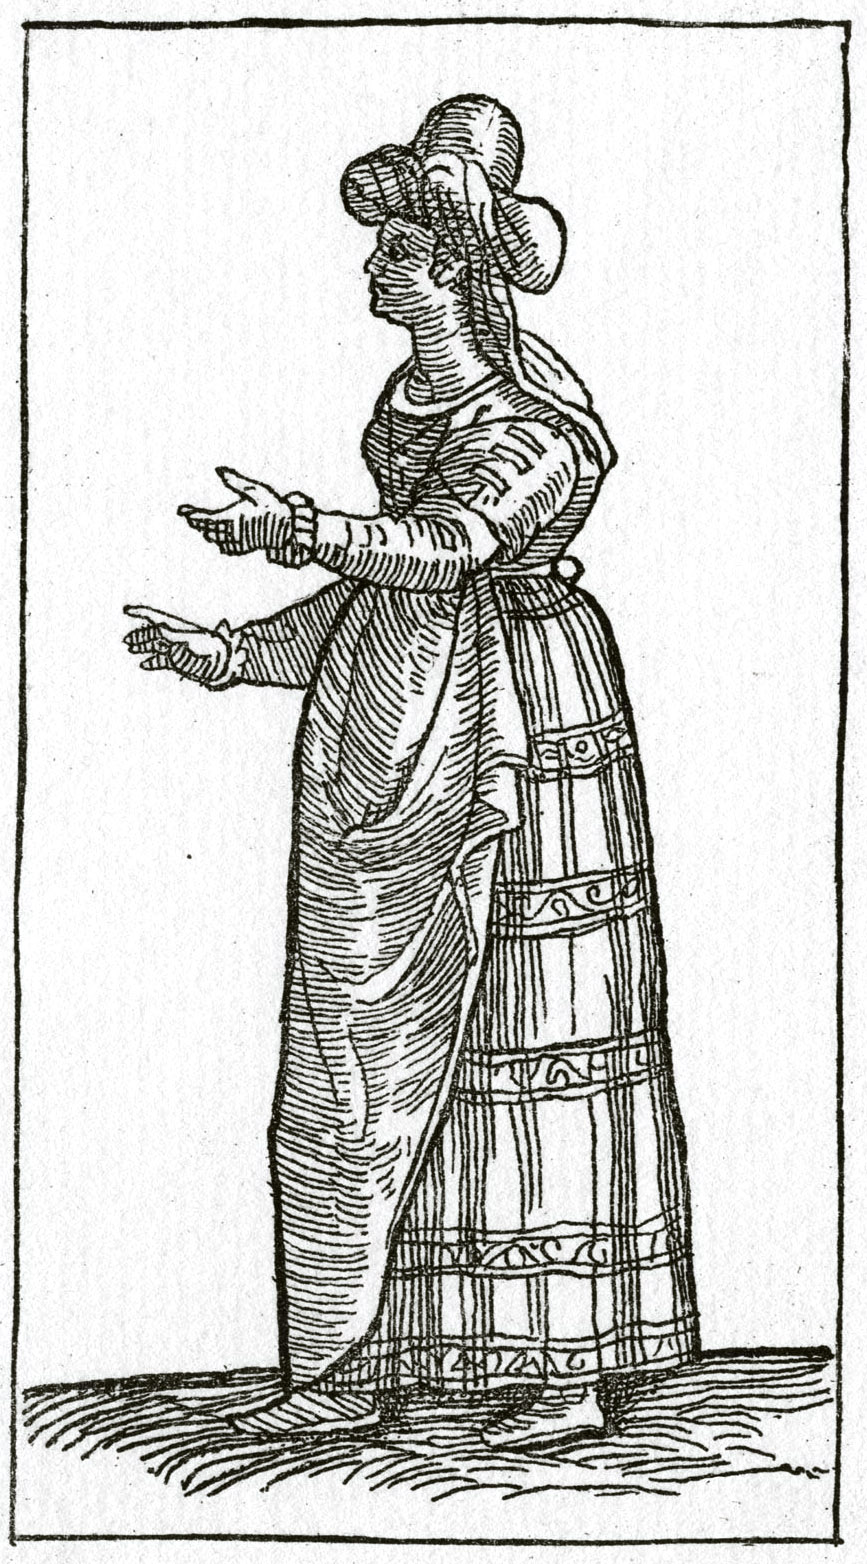 139. Гравюра из книги Чезаре Вечеллио, 1598